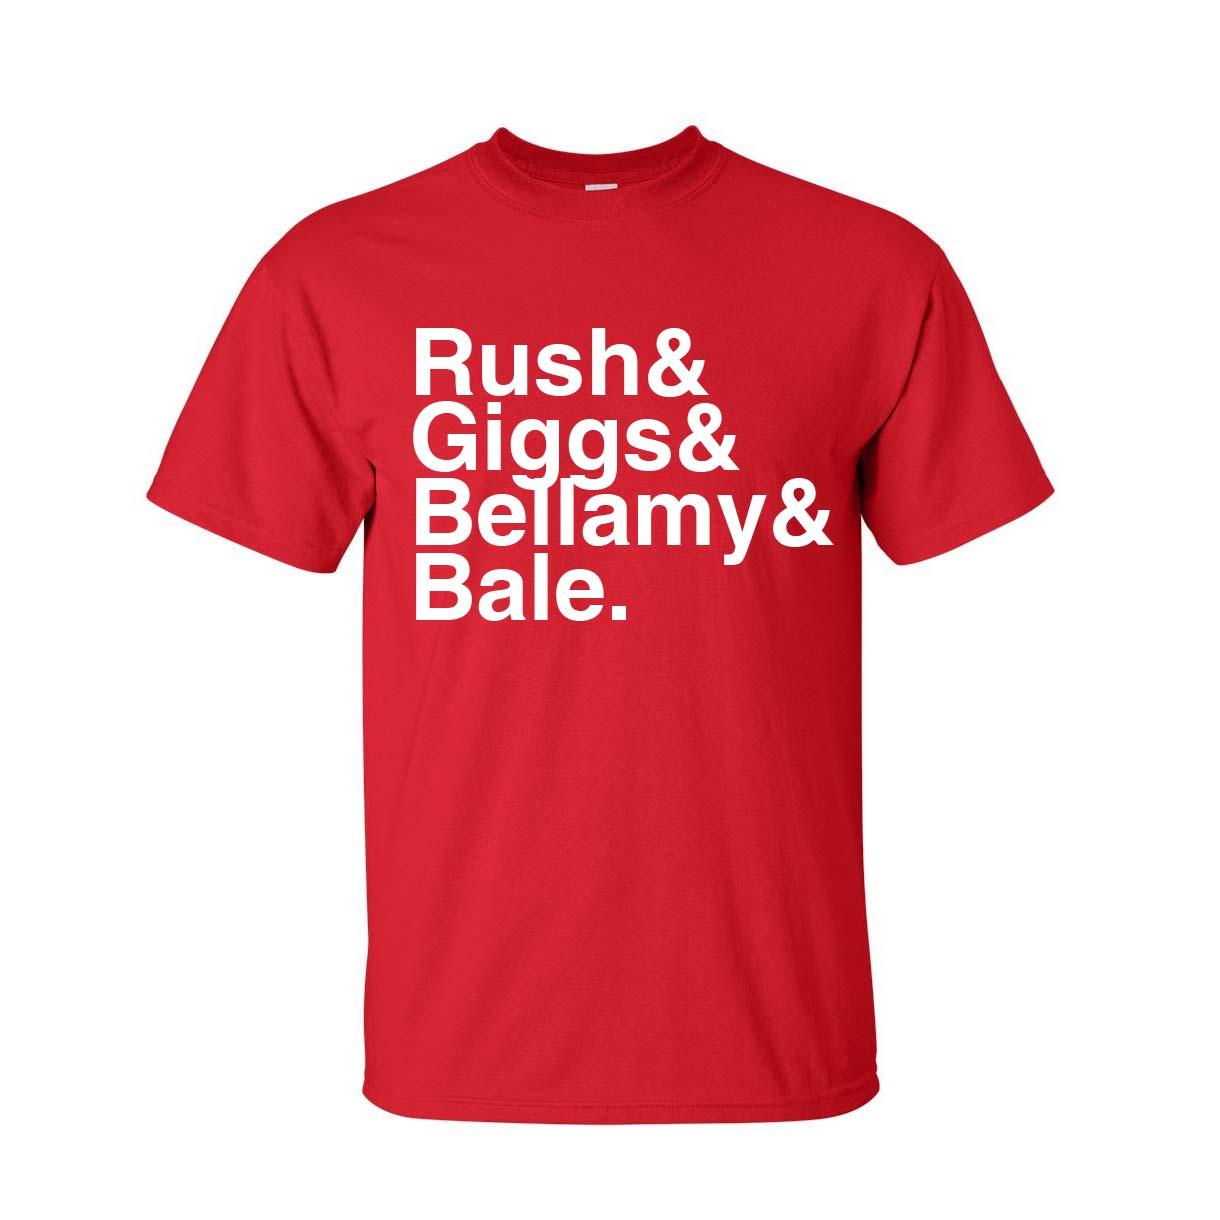 Wales Football Legends T-shirt (red)